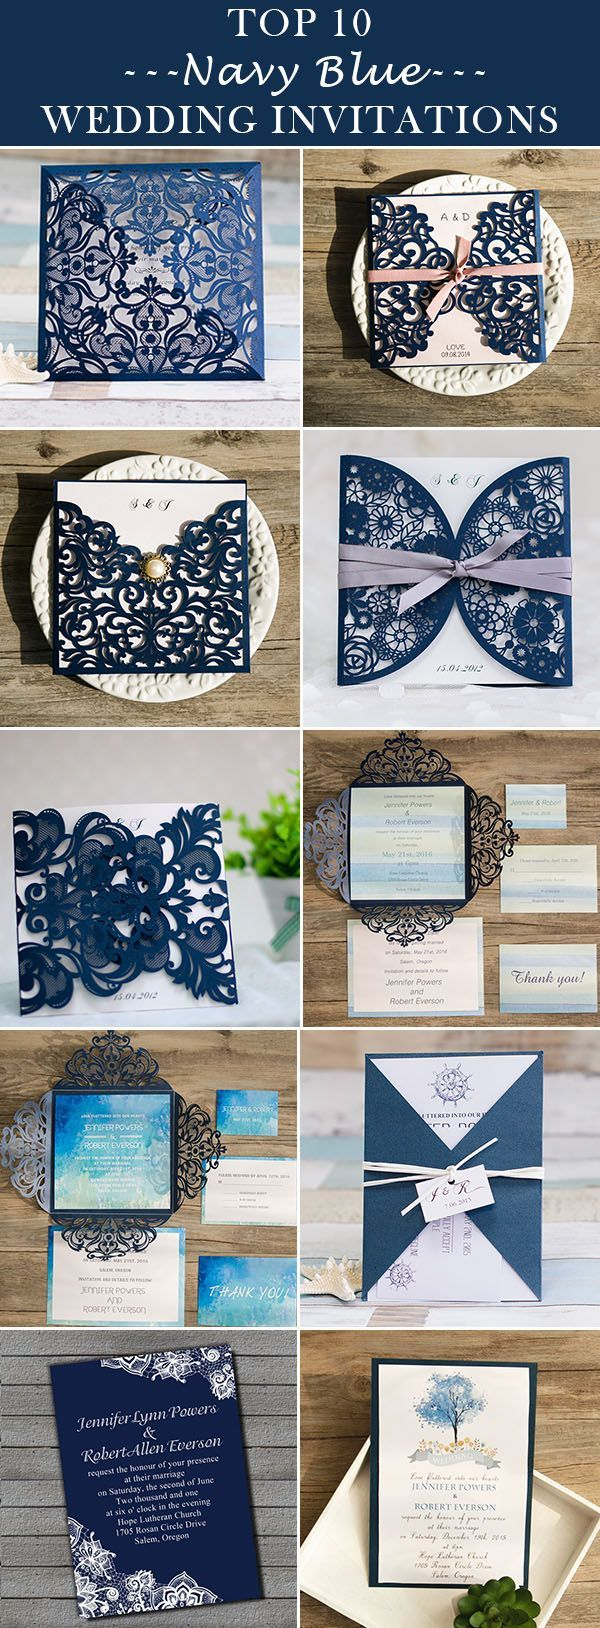 classic navy blue wedding invitations 2016 trends @ElegantWeddingInvites - FREE RSVP CARDS, FREE SHIPPING